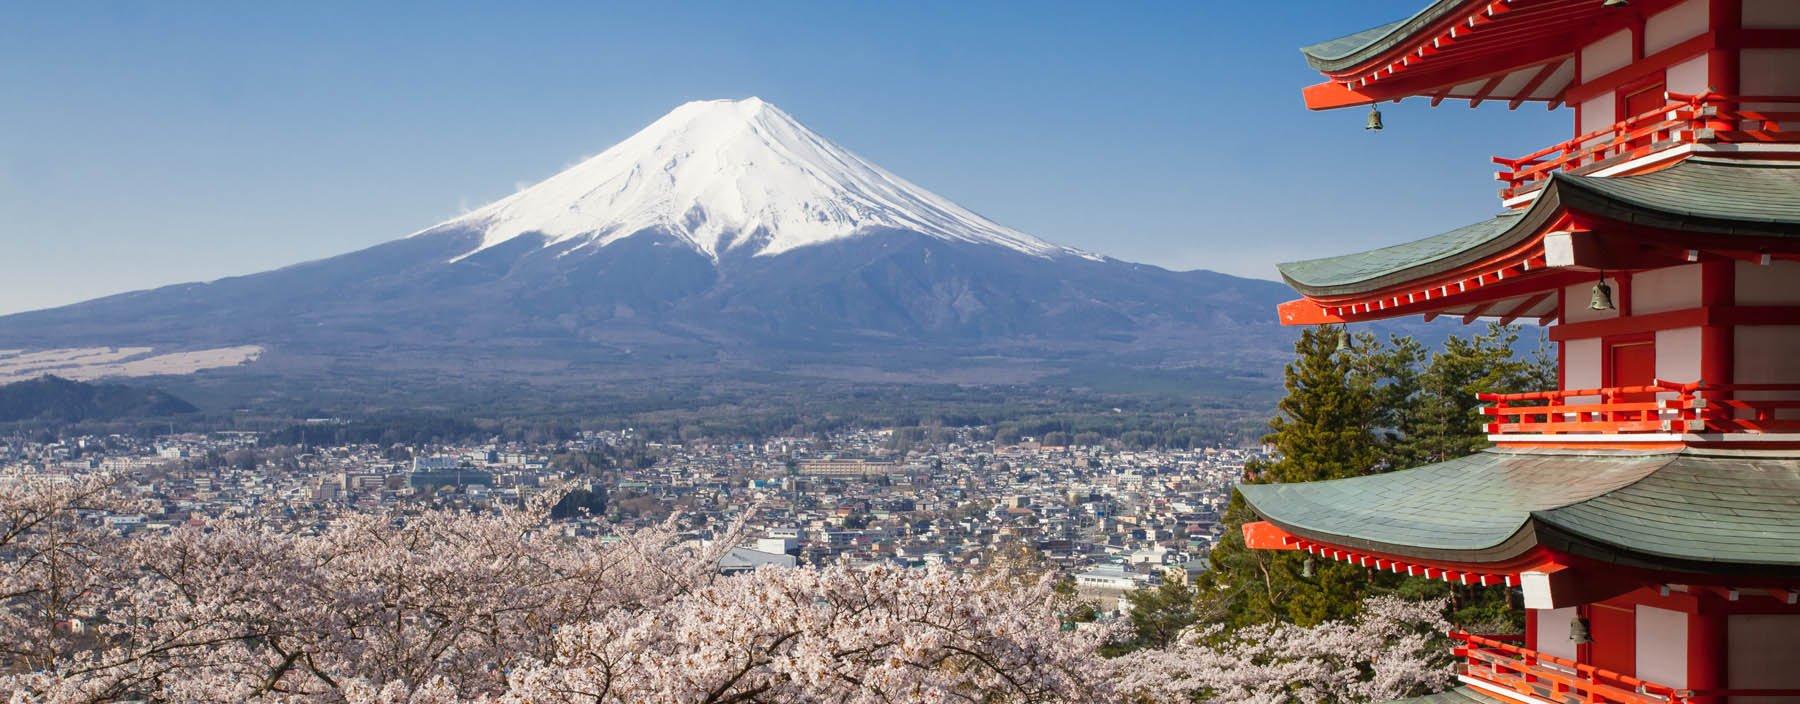 jp, mt fuji, mountain fuji and chureito red pagoda.jpg